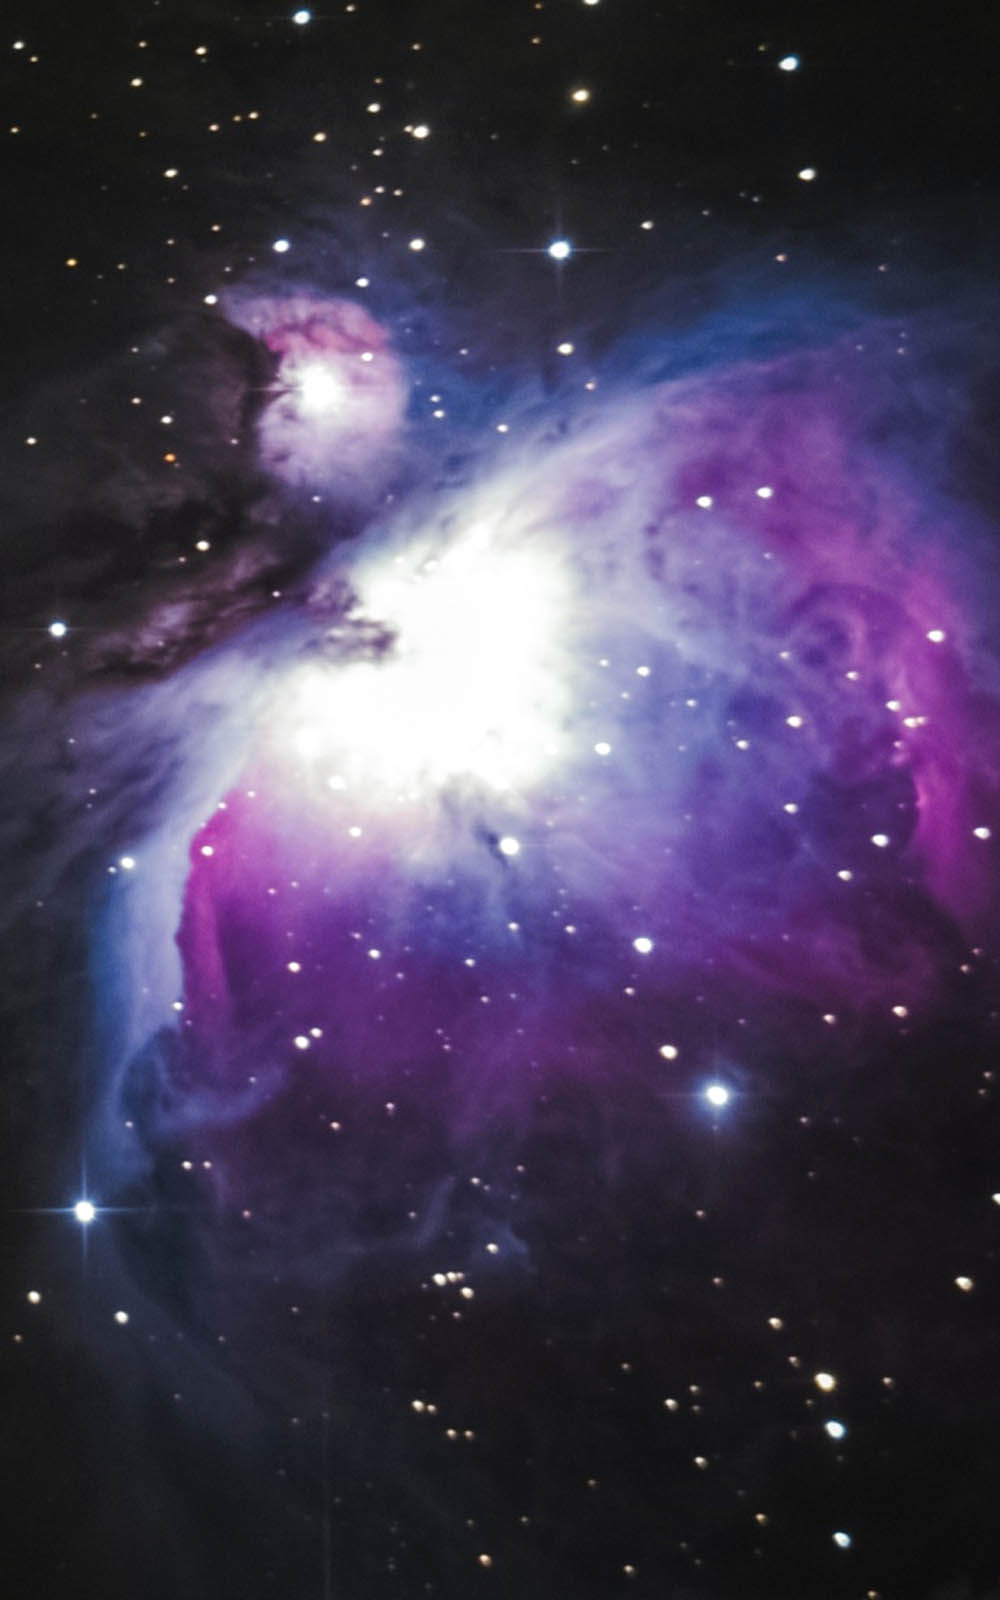 Nebula Space Galaxy 4K Ultra HD Mobile Wallpaper